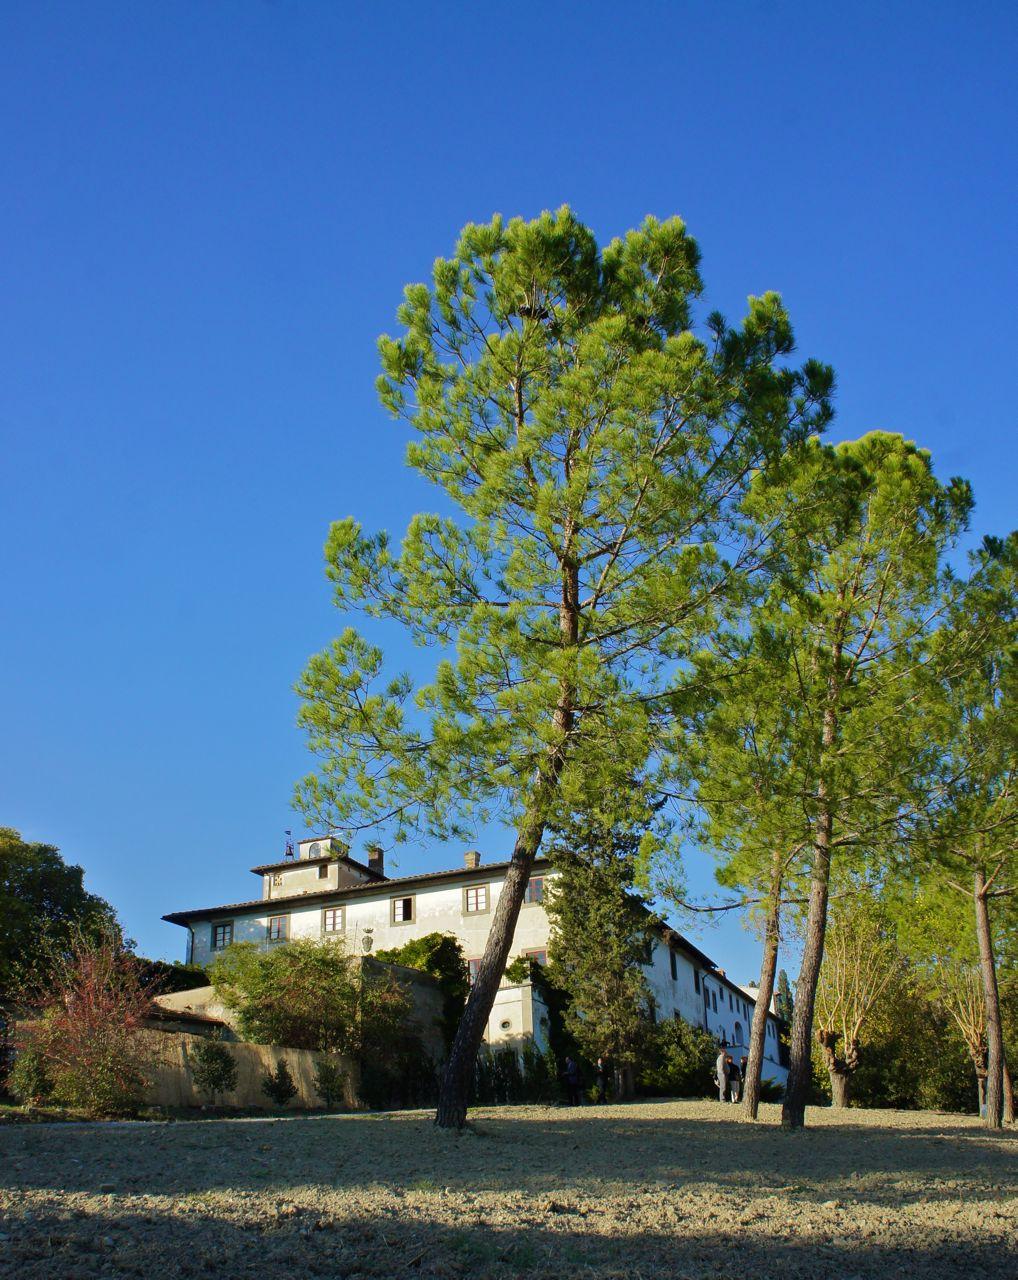 Les Journées Particulières- Pucci na Villa di Granaiolo